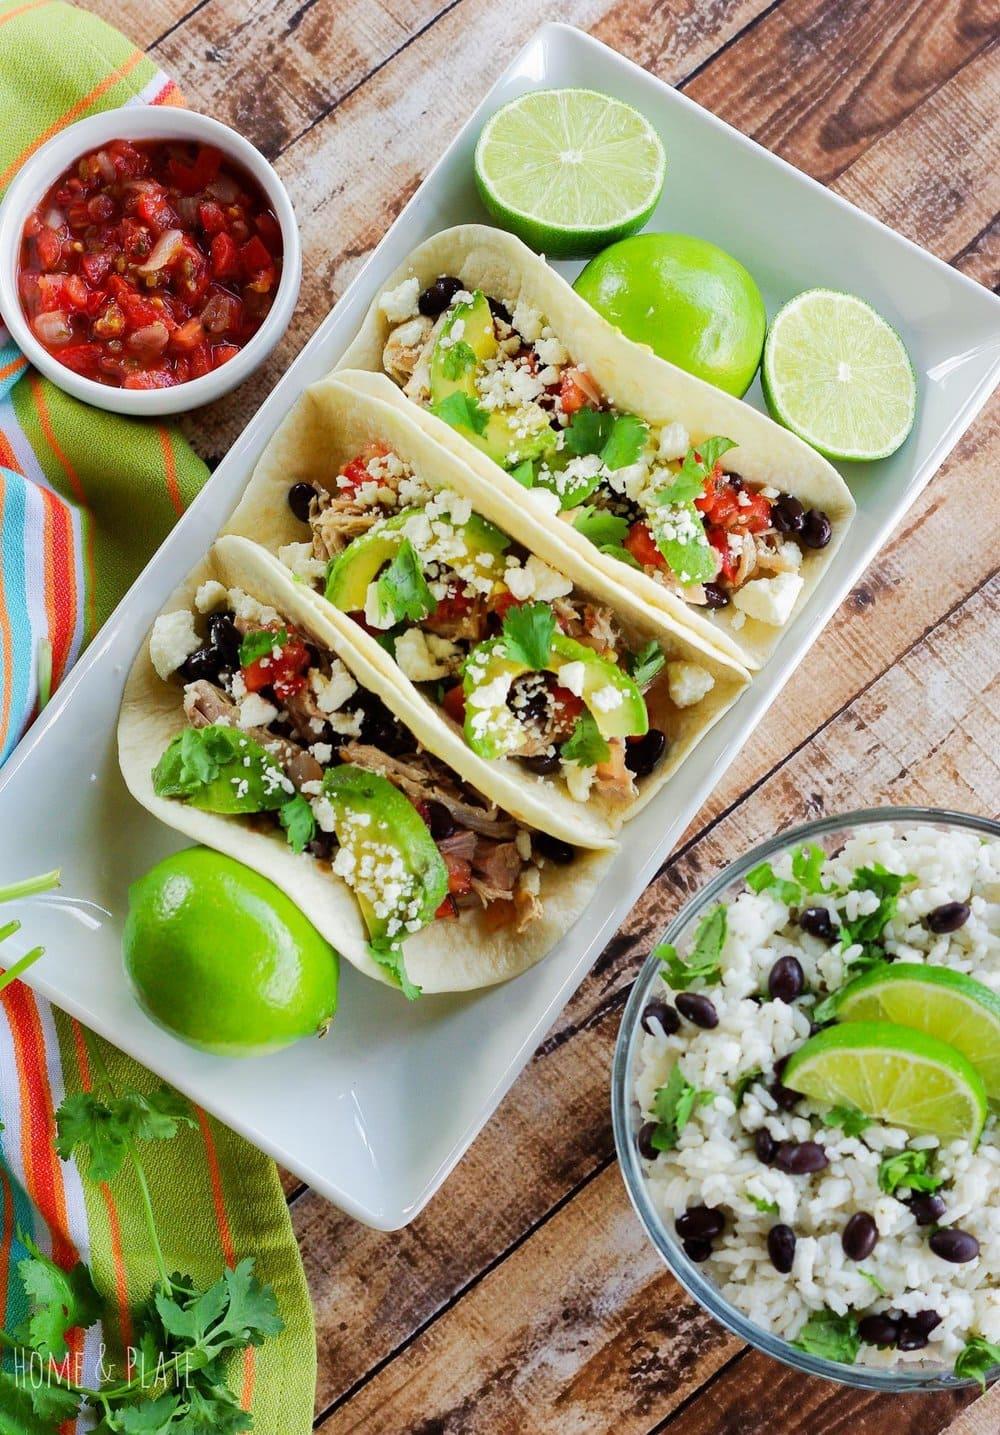 Cinco de Mayo Fiesta – 15 Tapas, Tacos and other Mexican Recipes